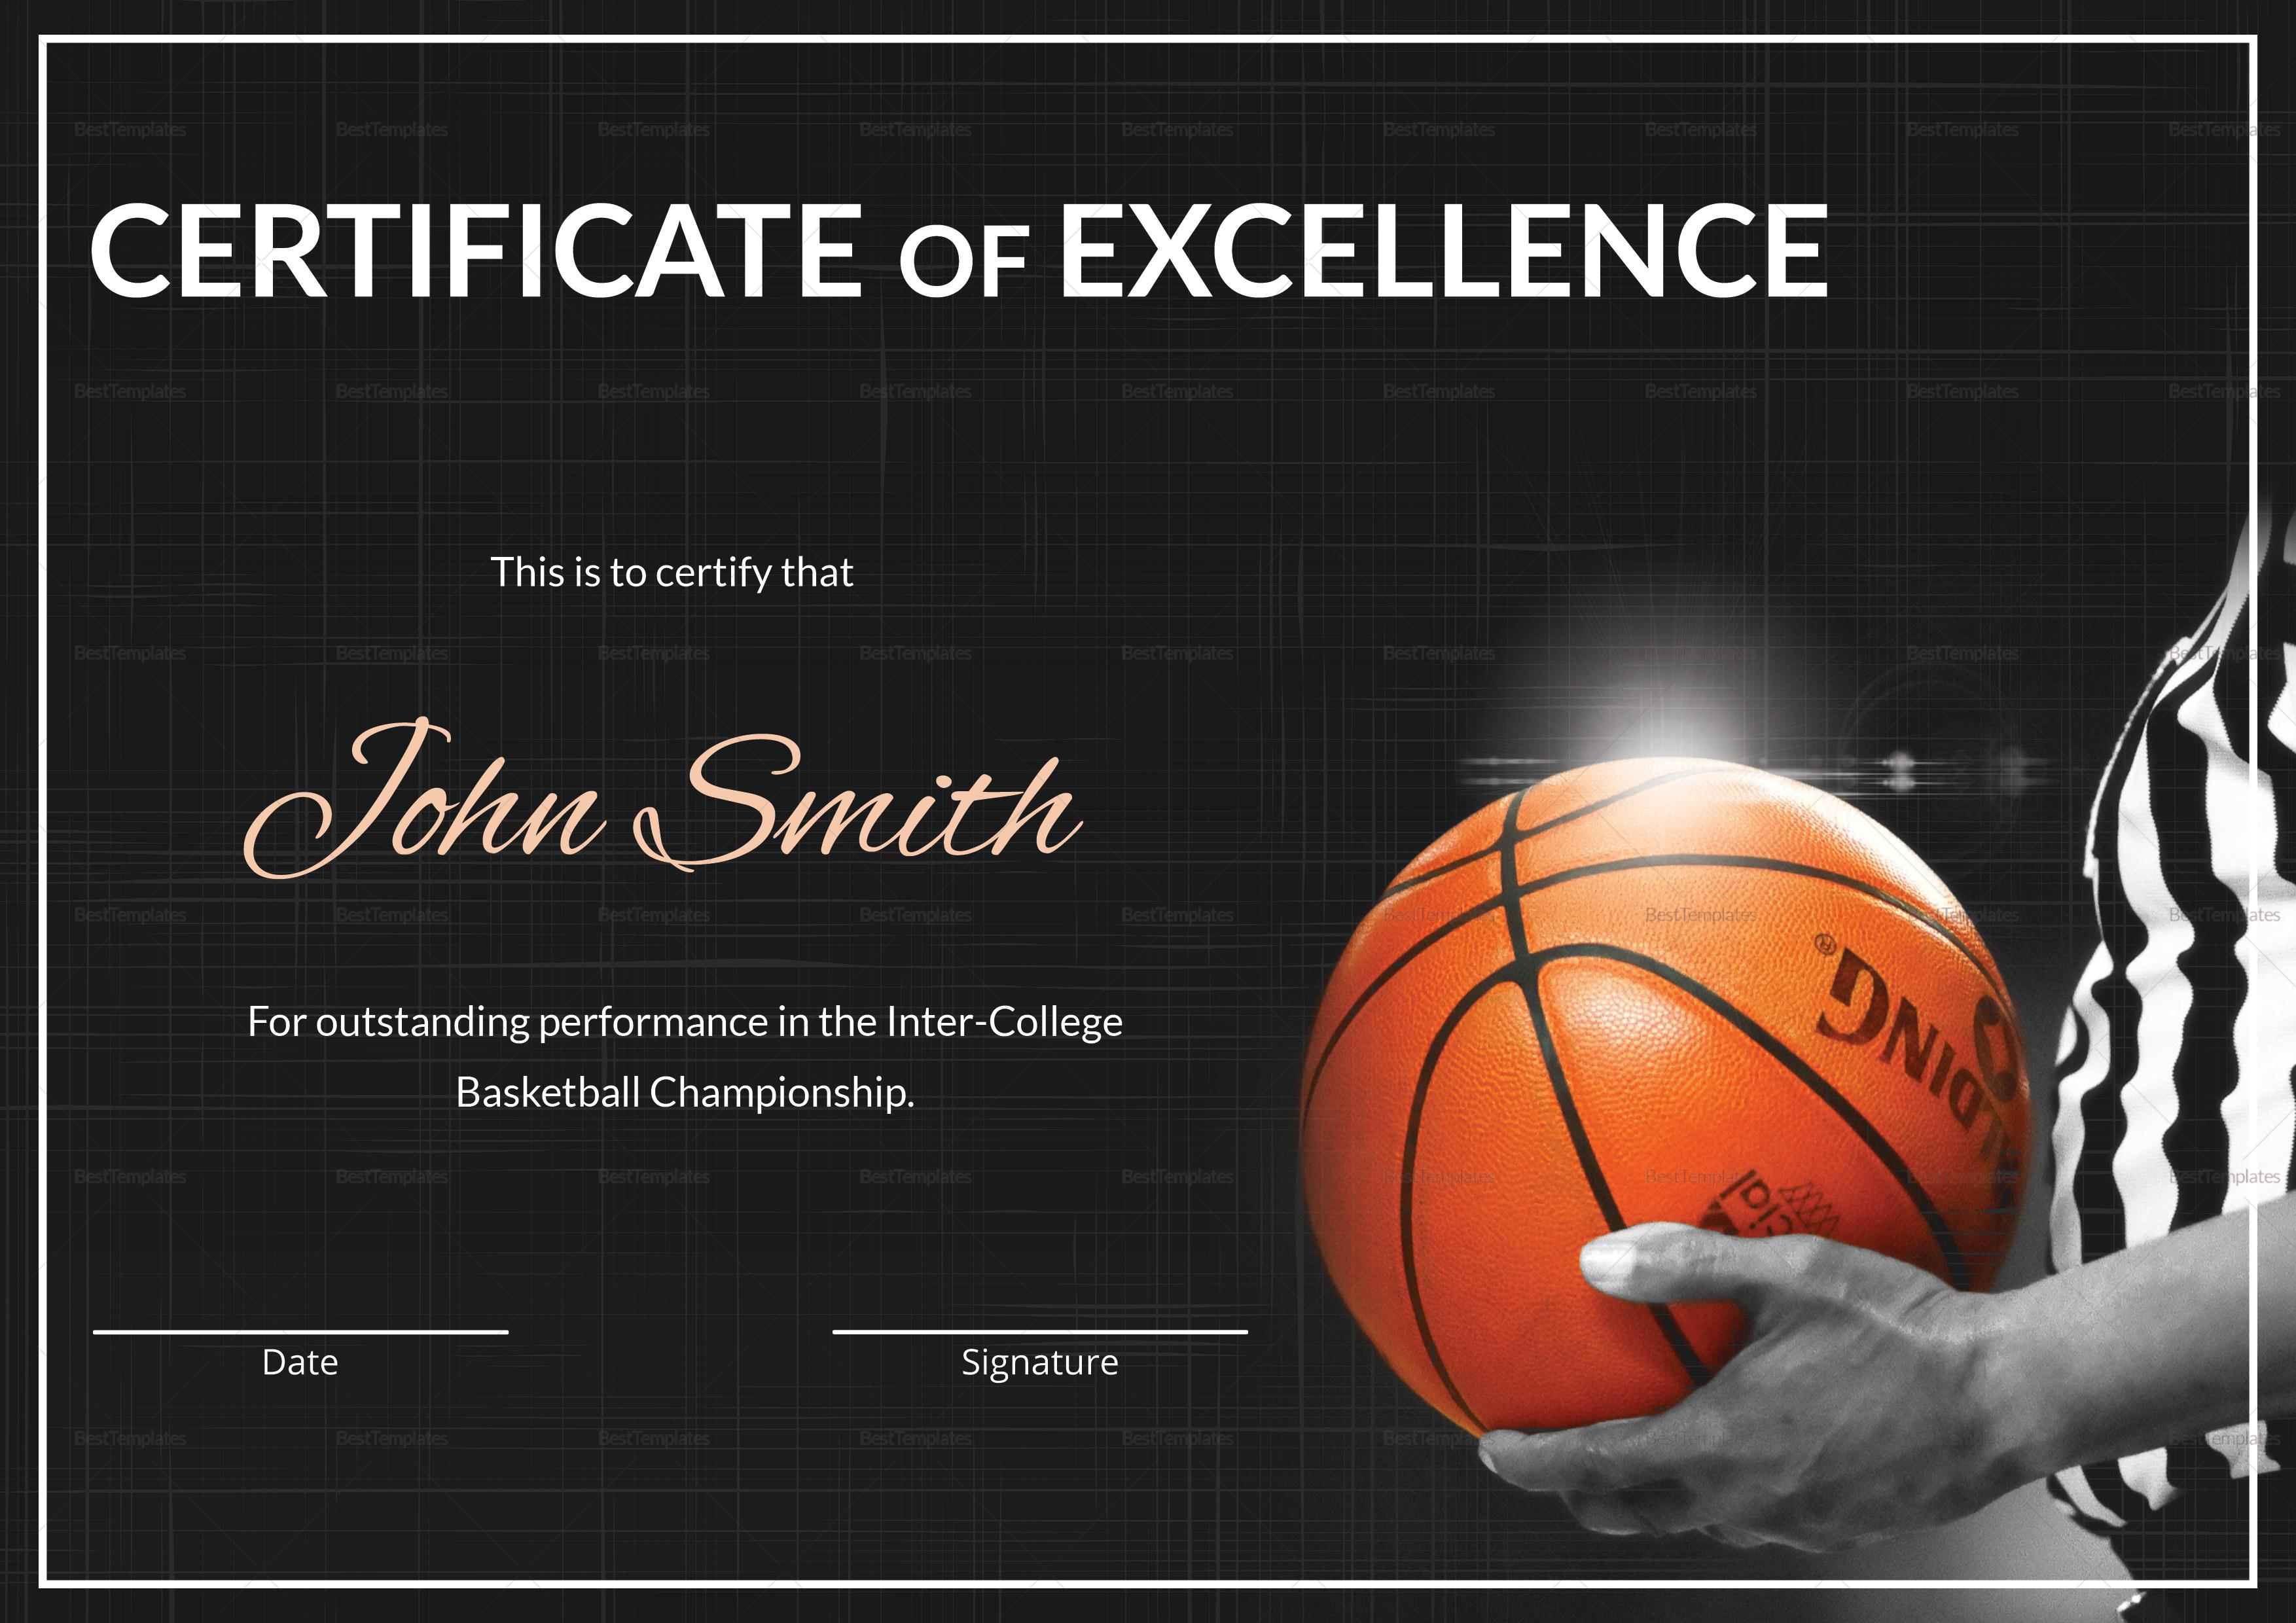 Basketball tournament certificate template image collections basketball excellence certificate design template in psd word basketball excellence certificate template basketball excellence certificate template xflitez Choice Image